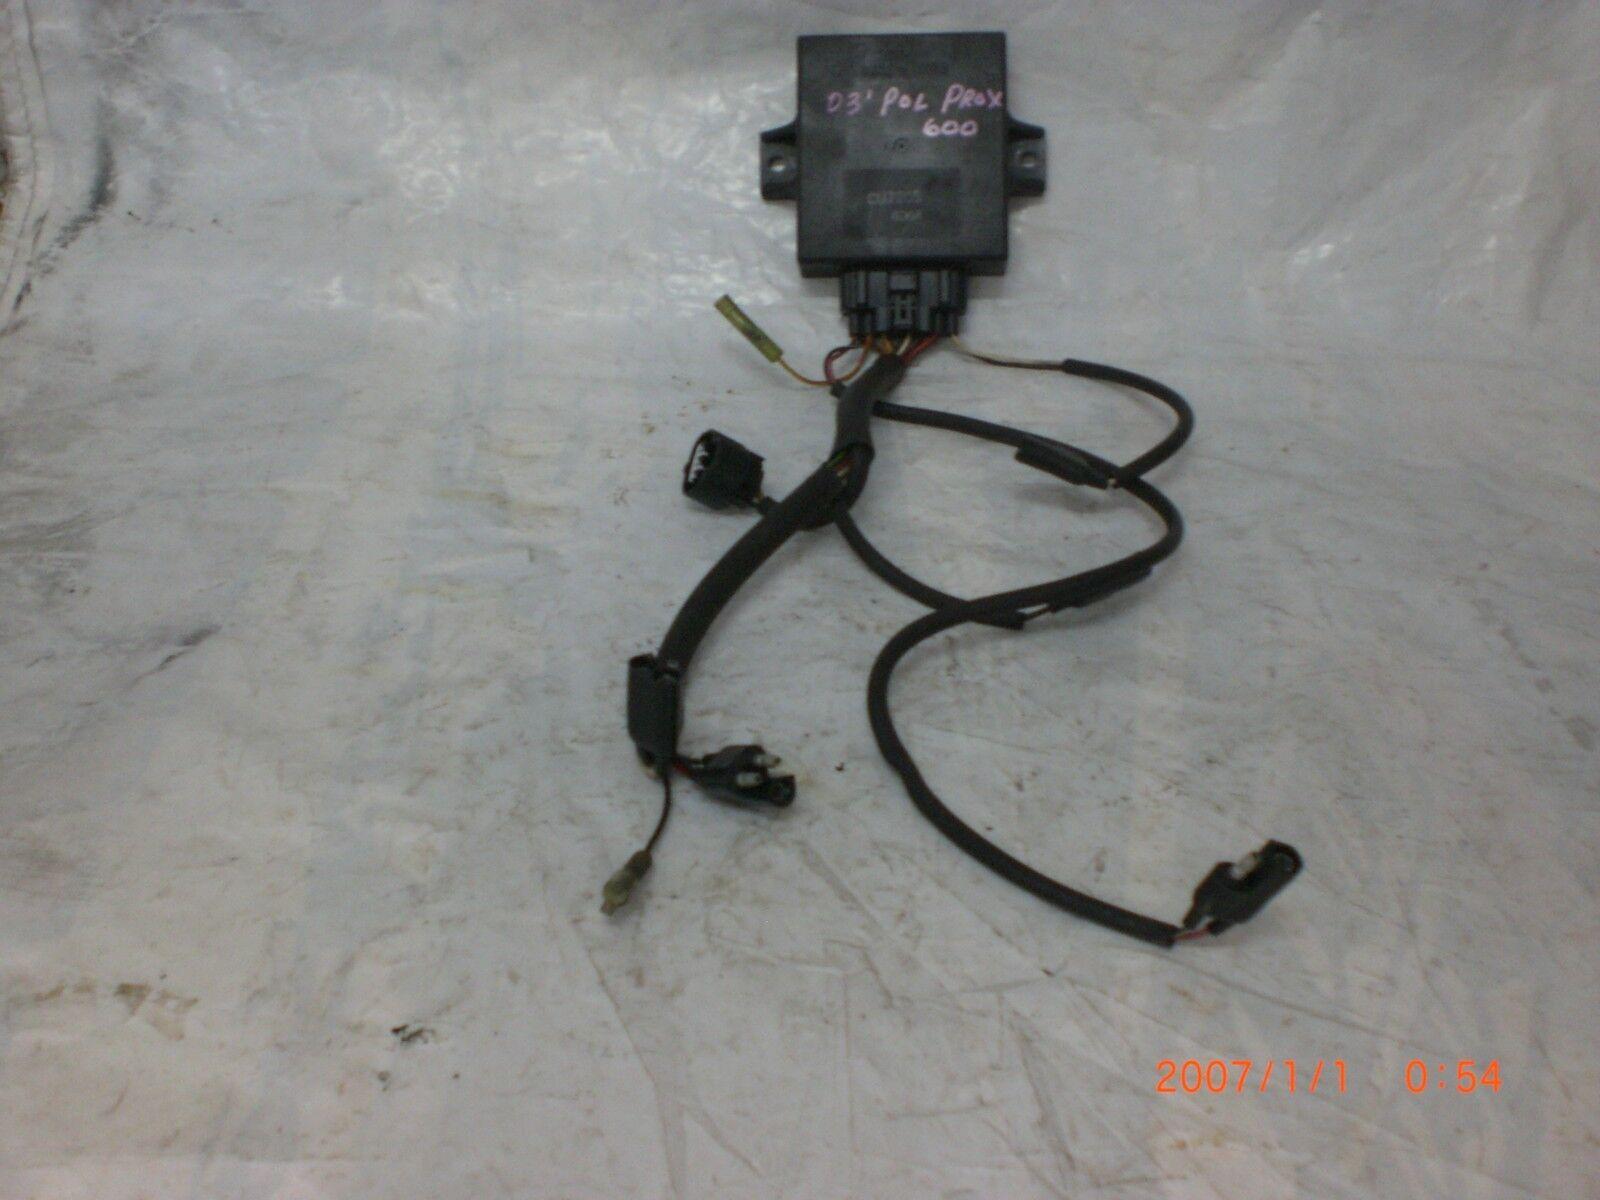 03 'Polaris Pro X 600 CDI och Harness Item